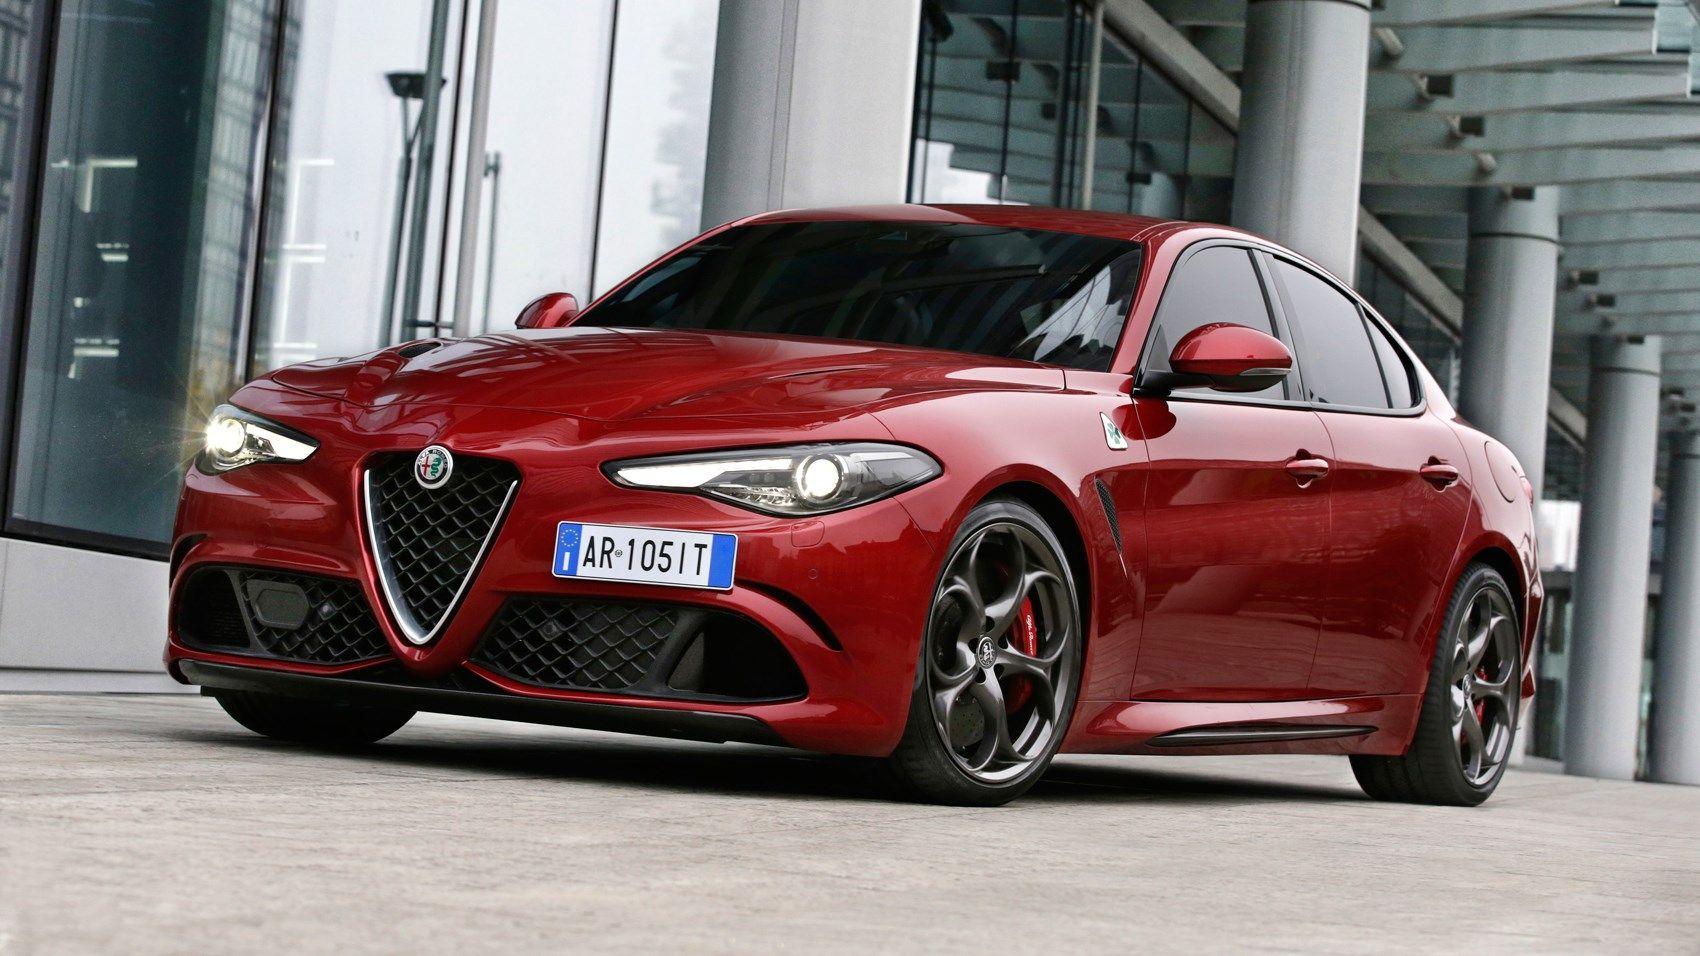 Alfa Romeo Giulia Quadrifoglio 2019 Review Racing Version Driven Alfa Romeo Giulia Quadrifoglio Alfa Romeo Giulia Alfa Romeo